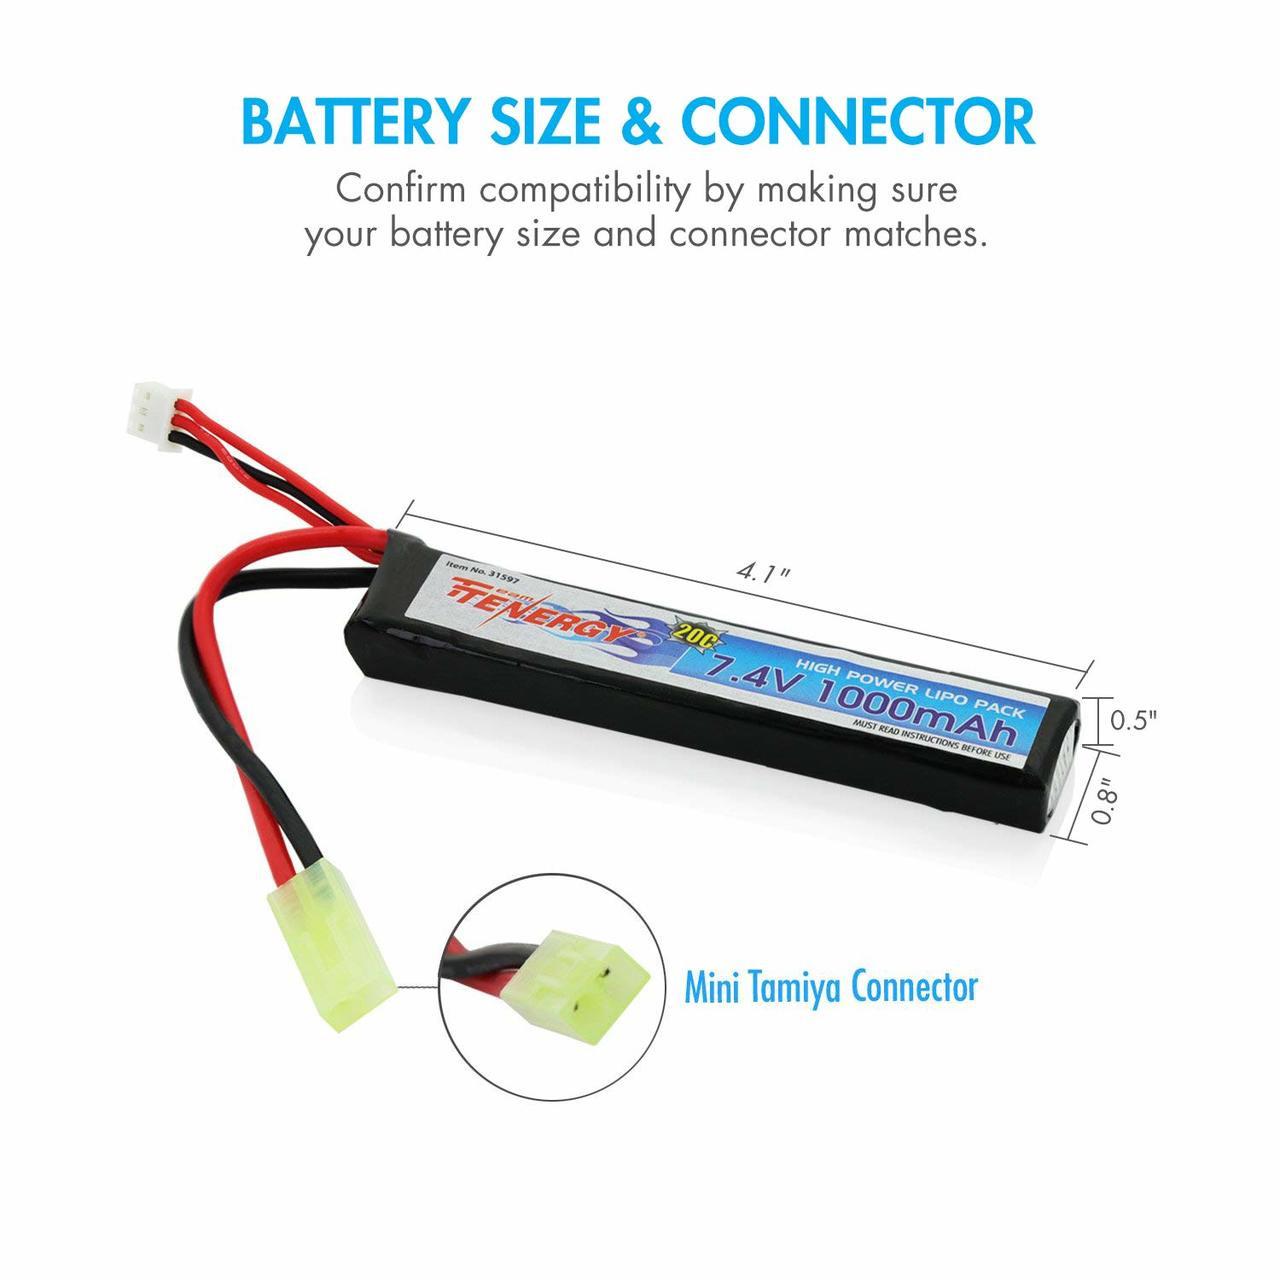 Tenergy Airsoft Li-Po 7.4V 1000mAh Stick Battery Pack w/ Mini Tamiya Connector